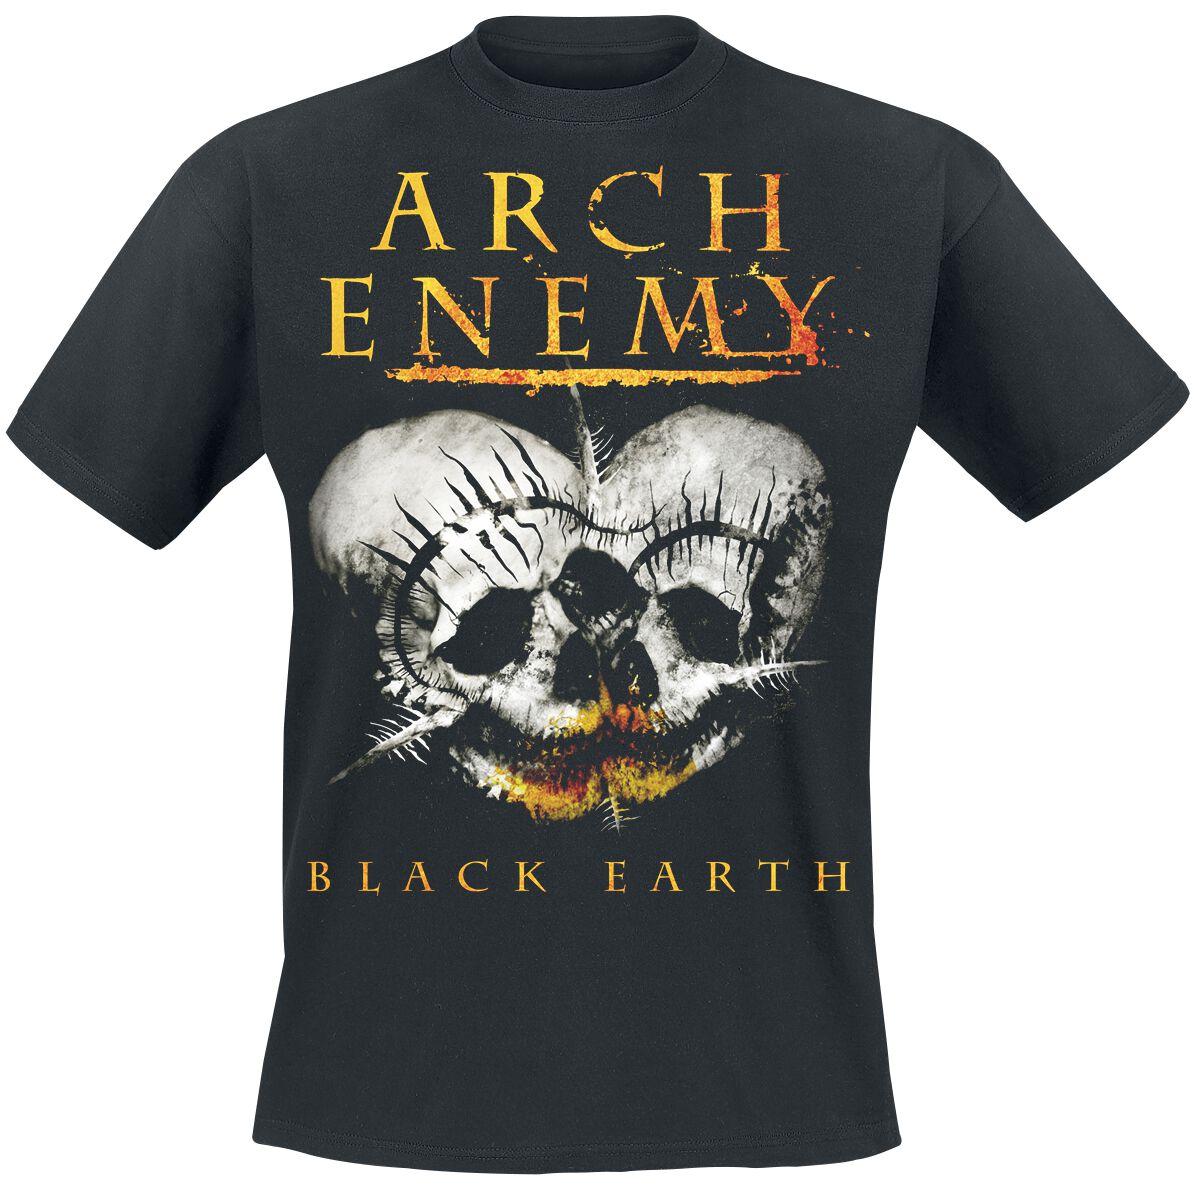 Zespoły - Koszulki - T-Shirt Arch Enemy Black earth T-Shirt czarny - 362210